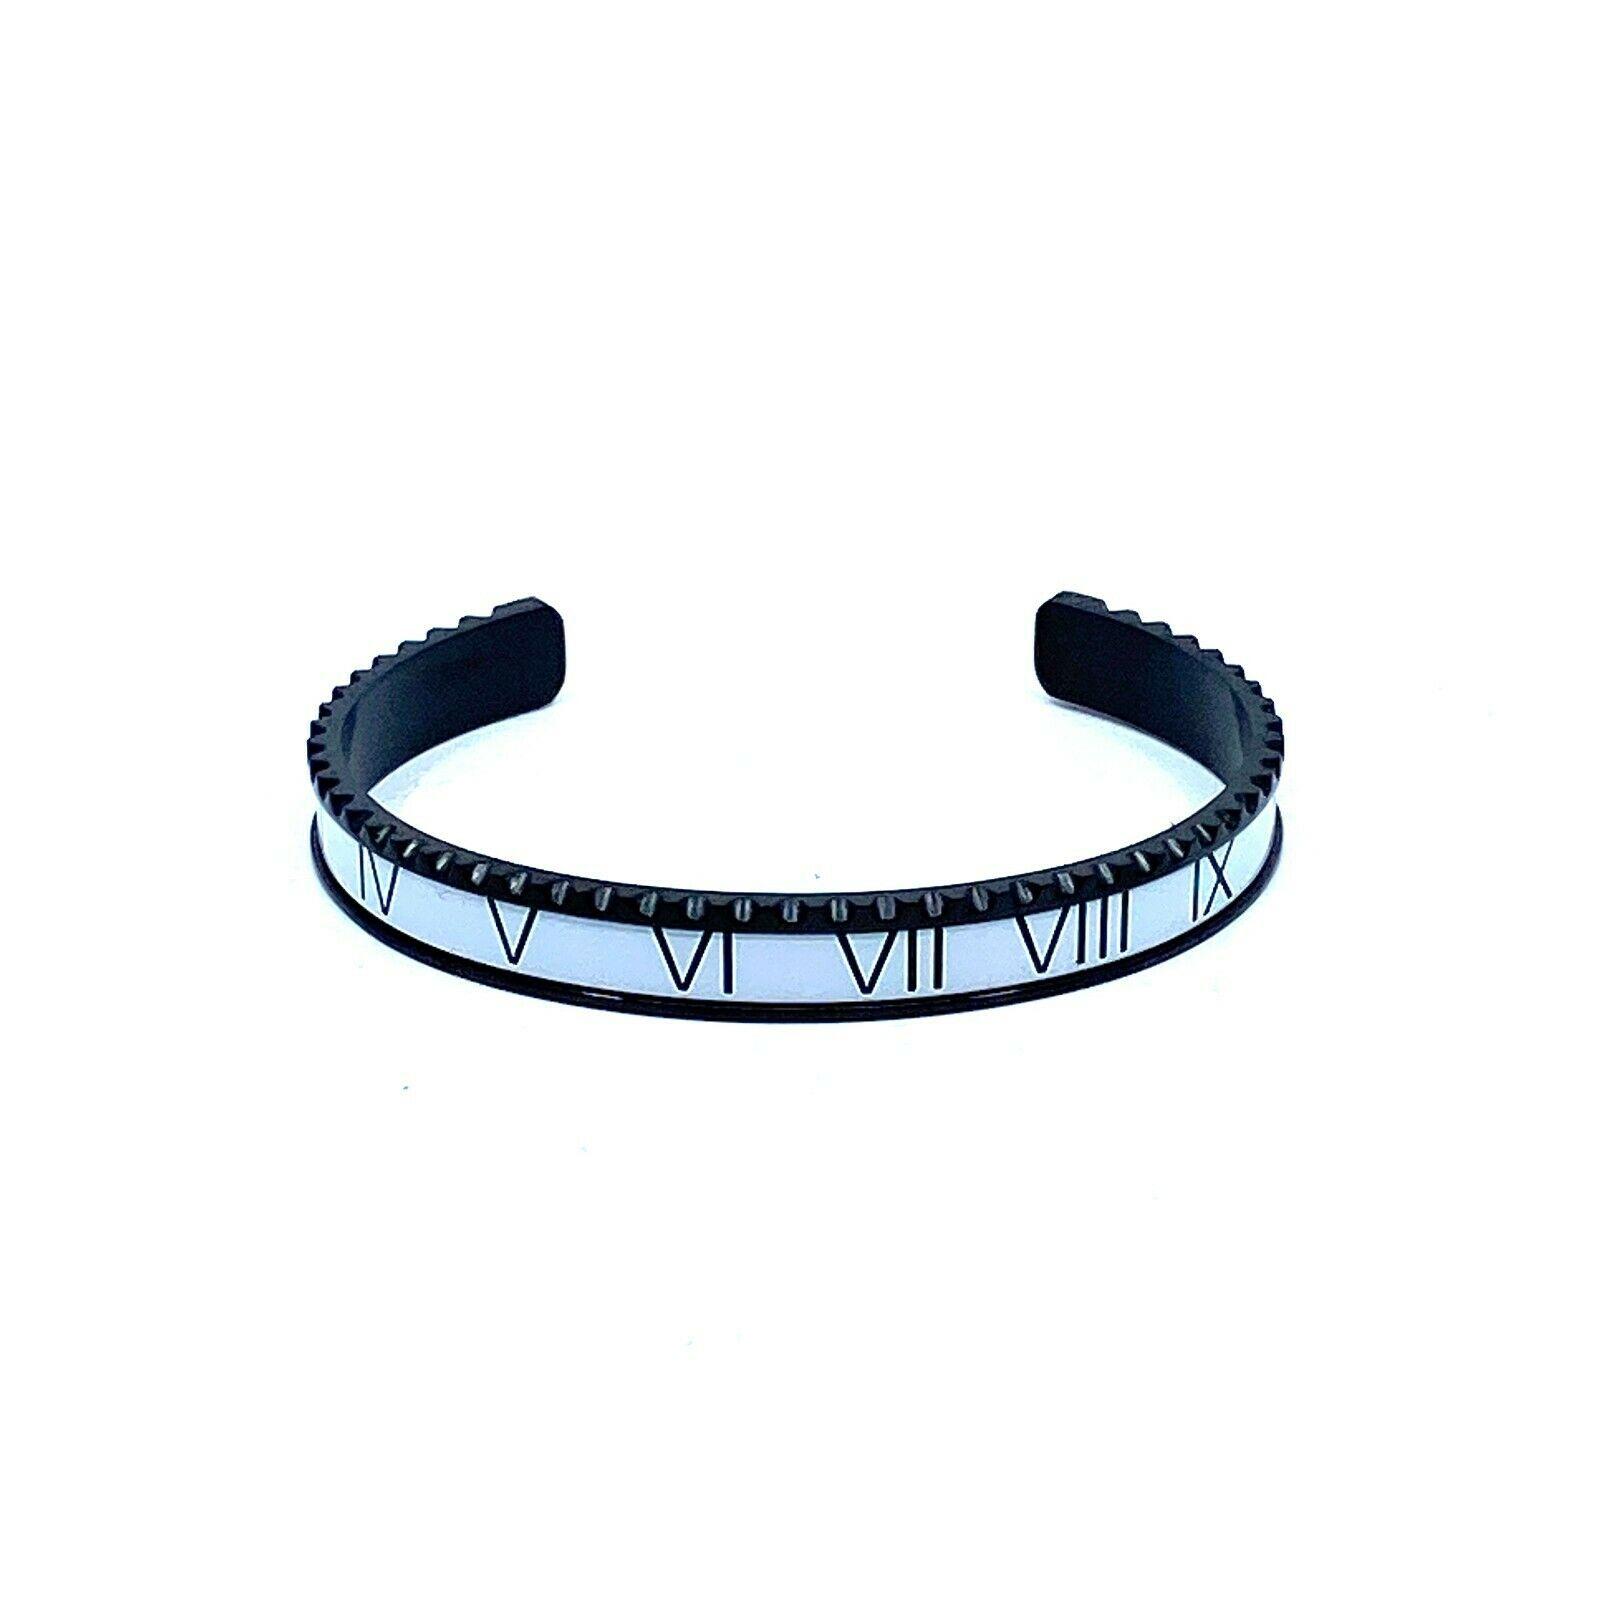 White & Black Speedometer Style Bracelet 1pcs Stainless Steel Watch Bangle